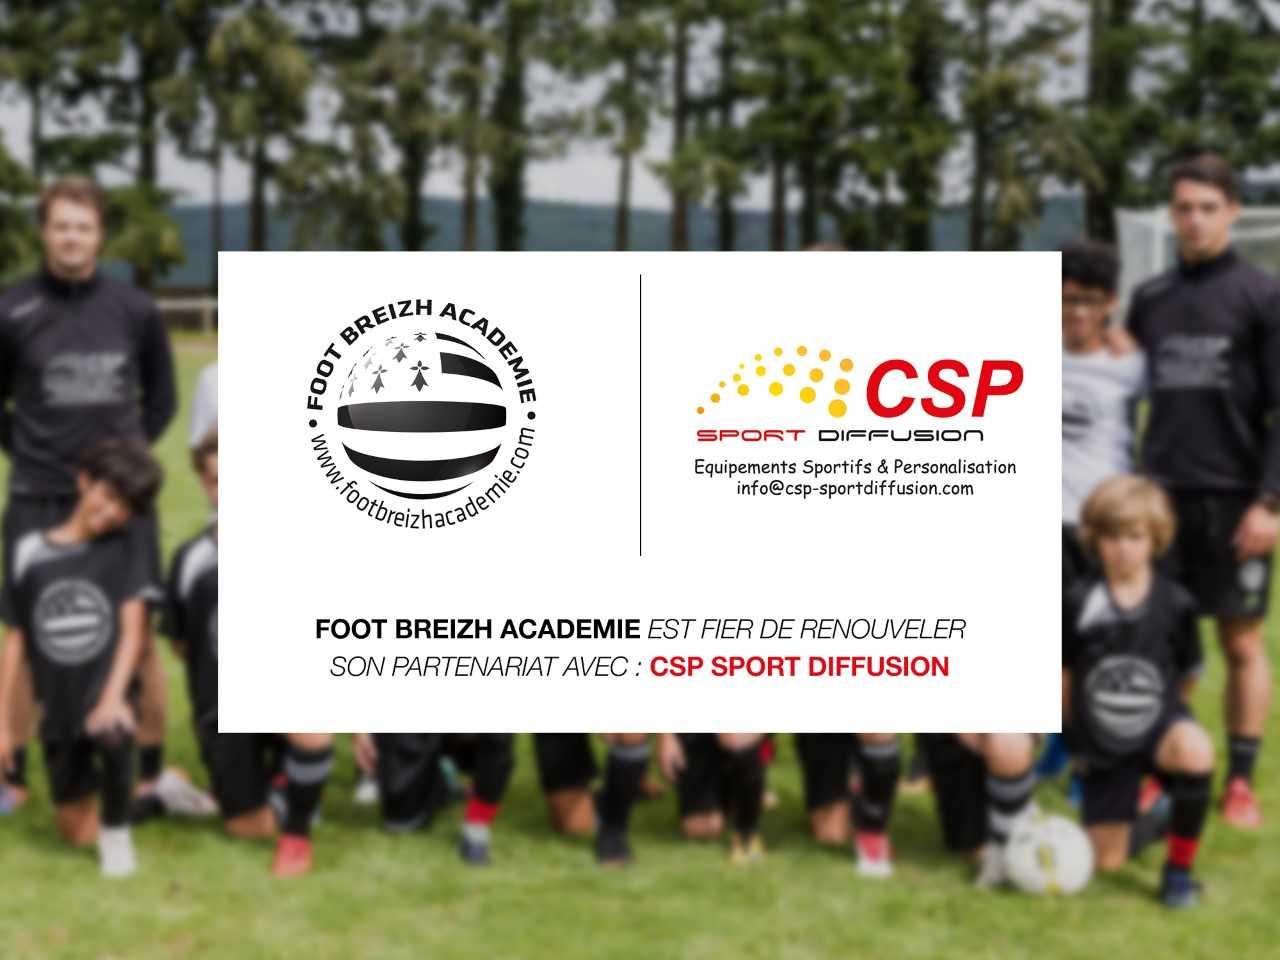 sponsors-foot-breizh-academie-CSP